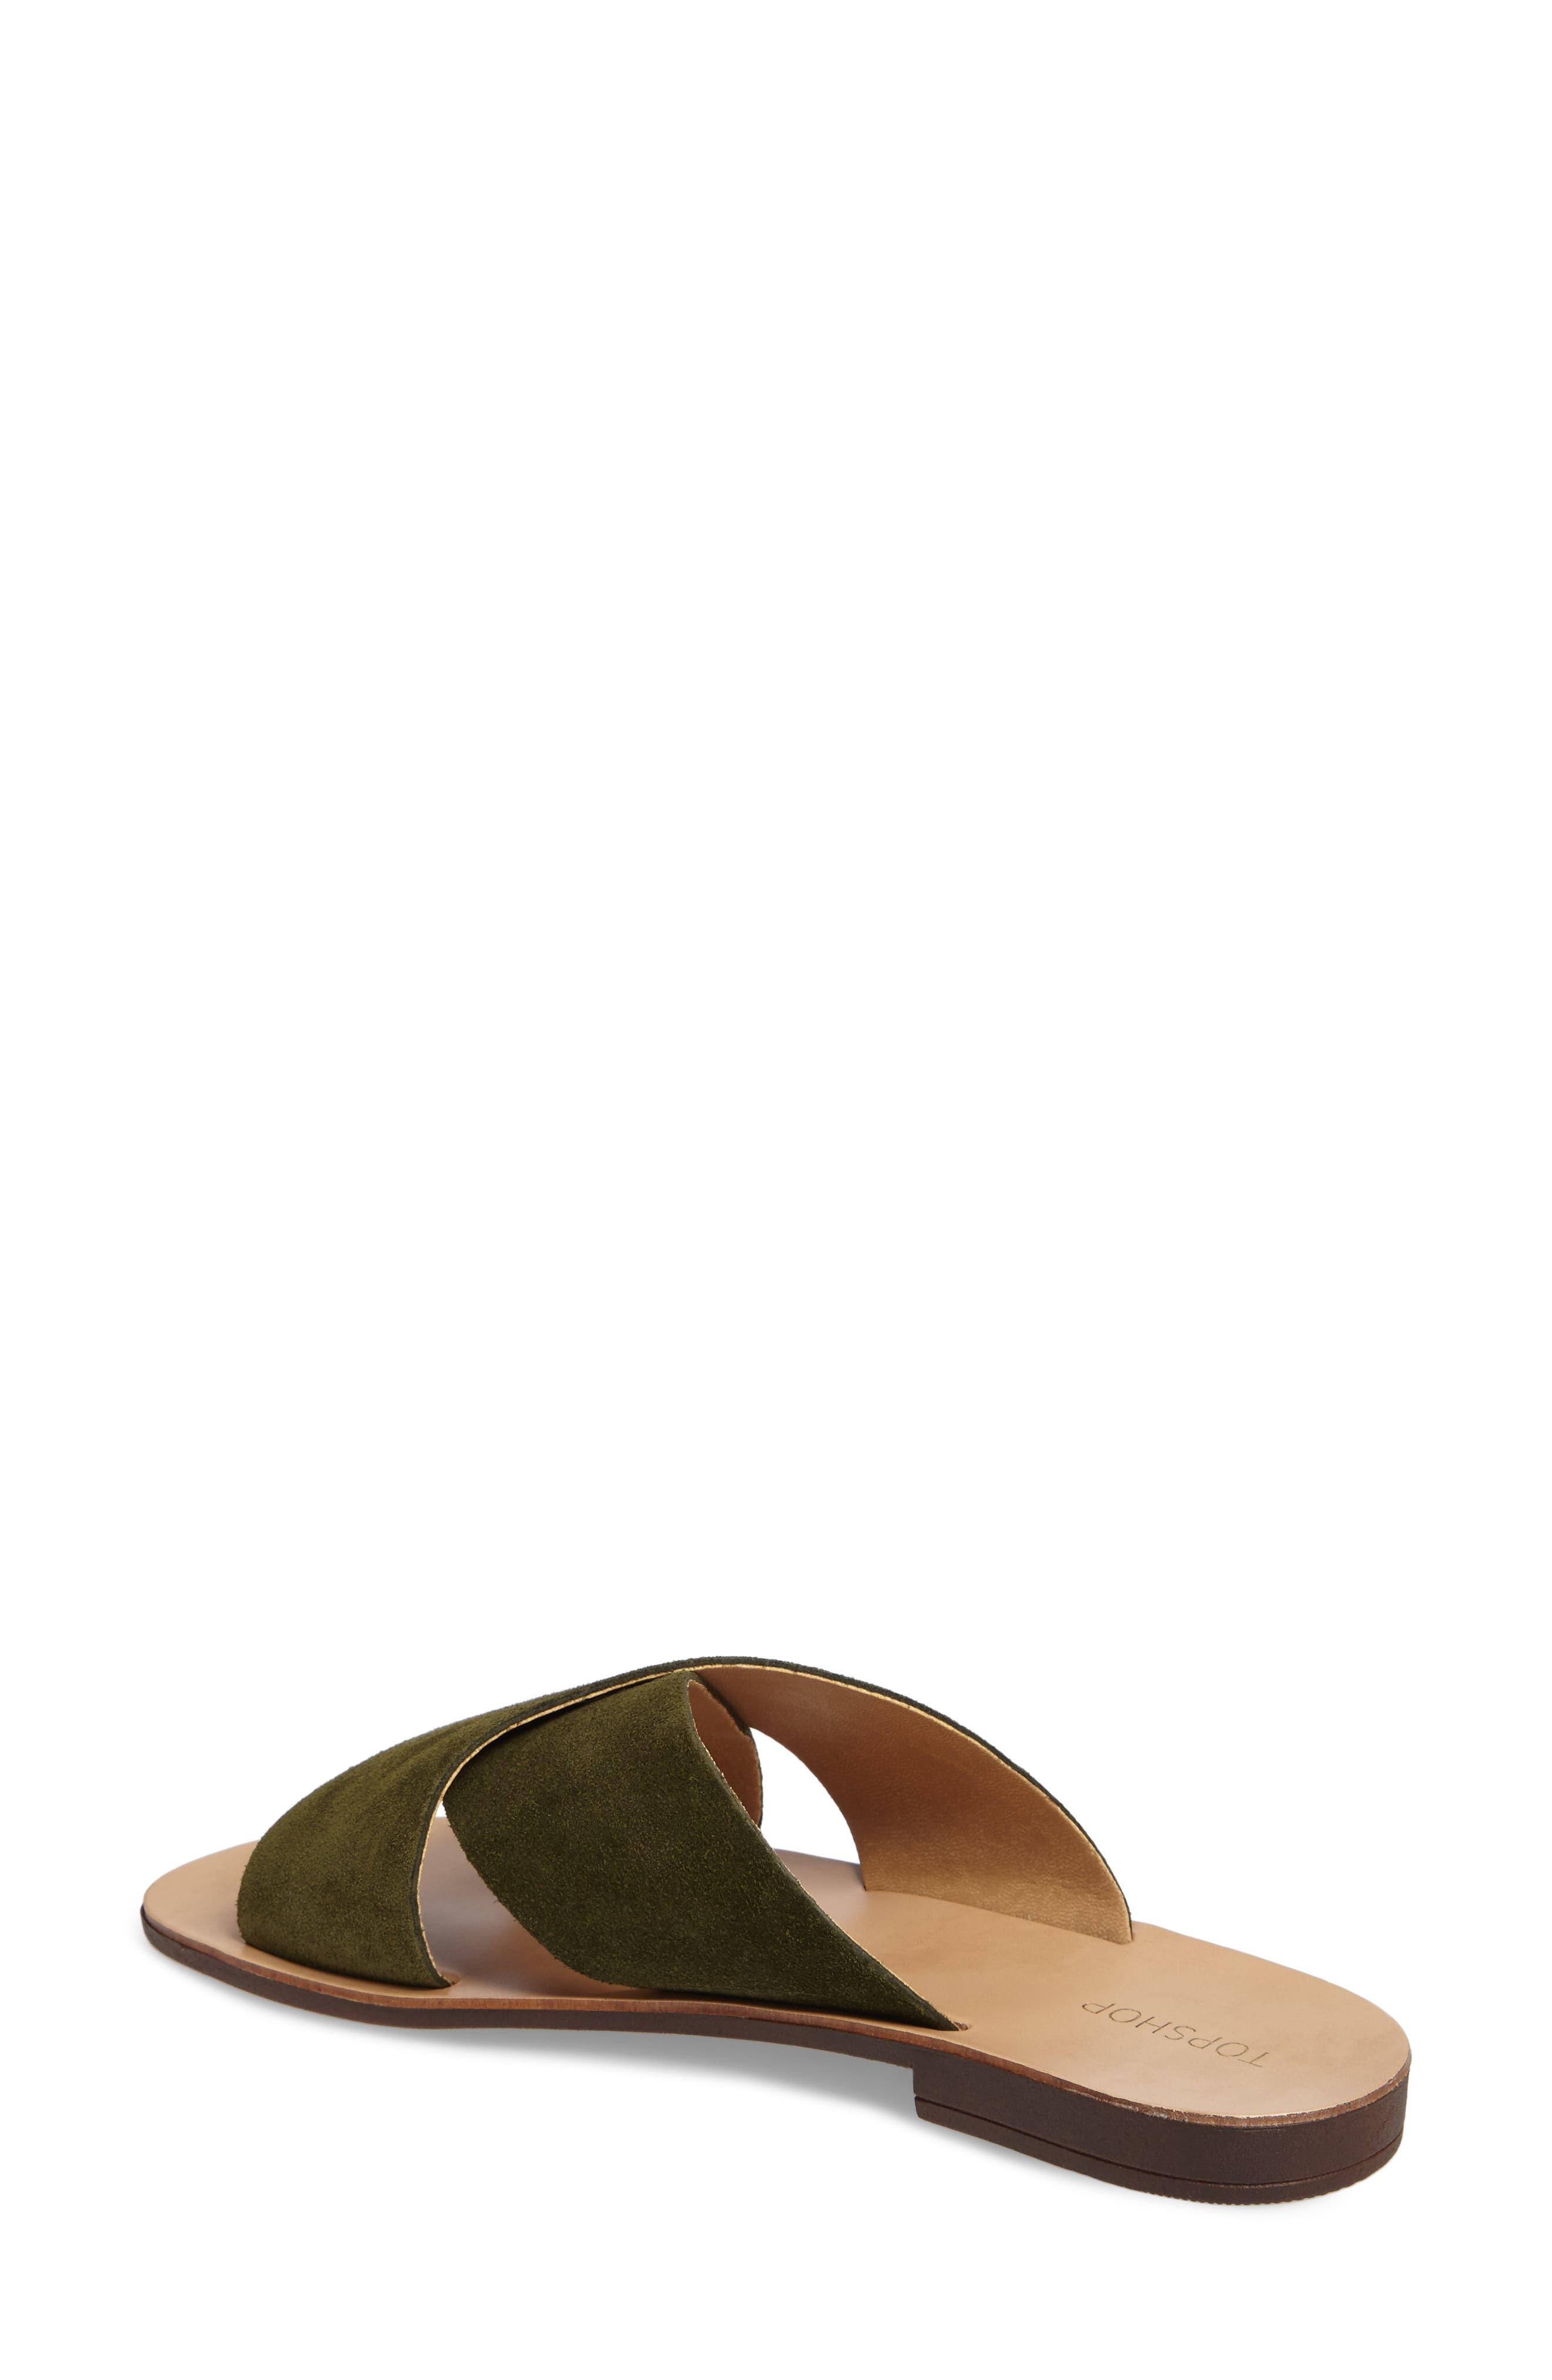 Hawaii Crisscross Sandal,                             Alternate thumbnail 13, color,